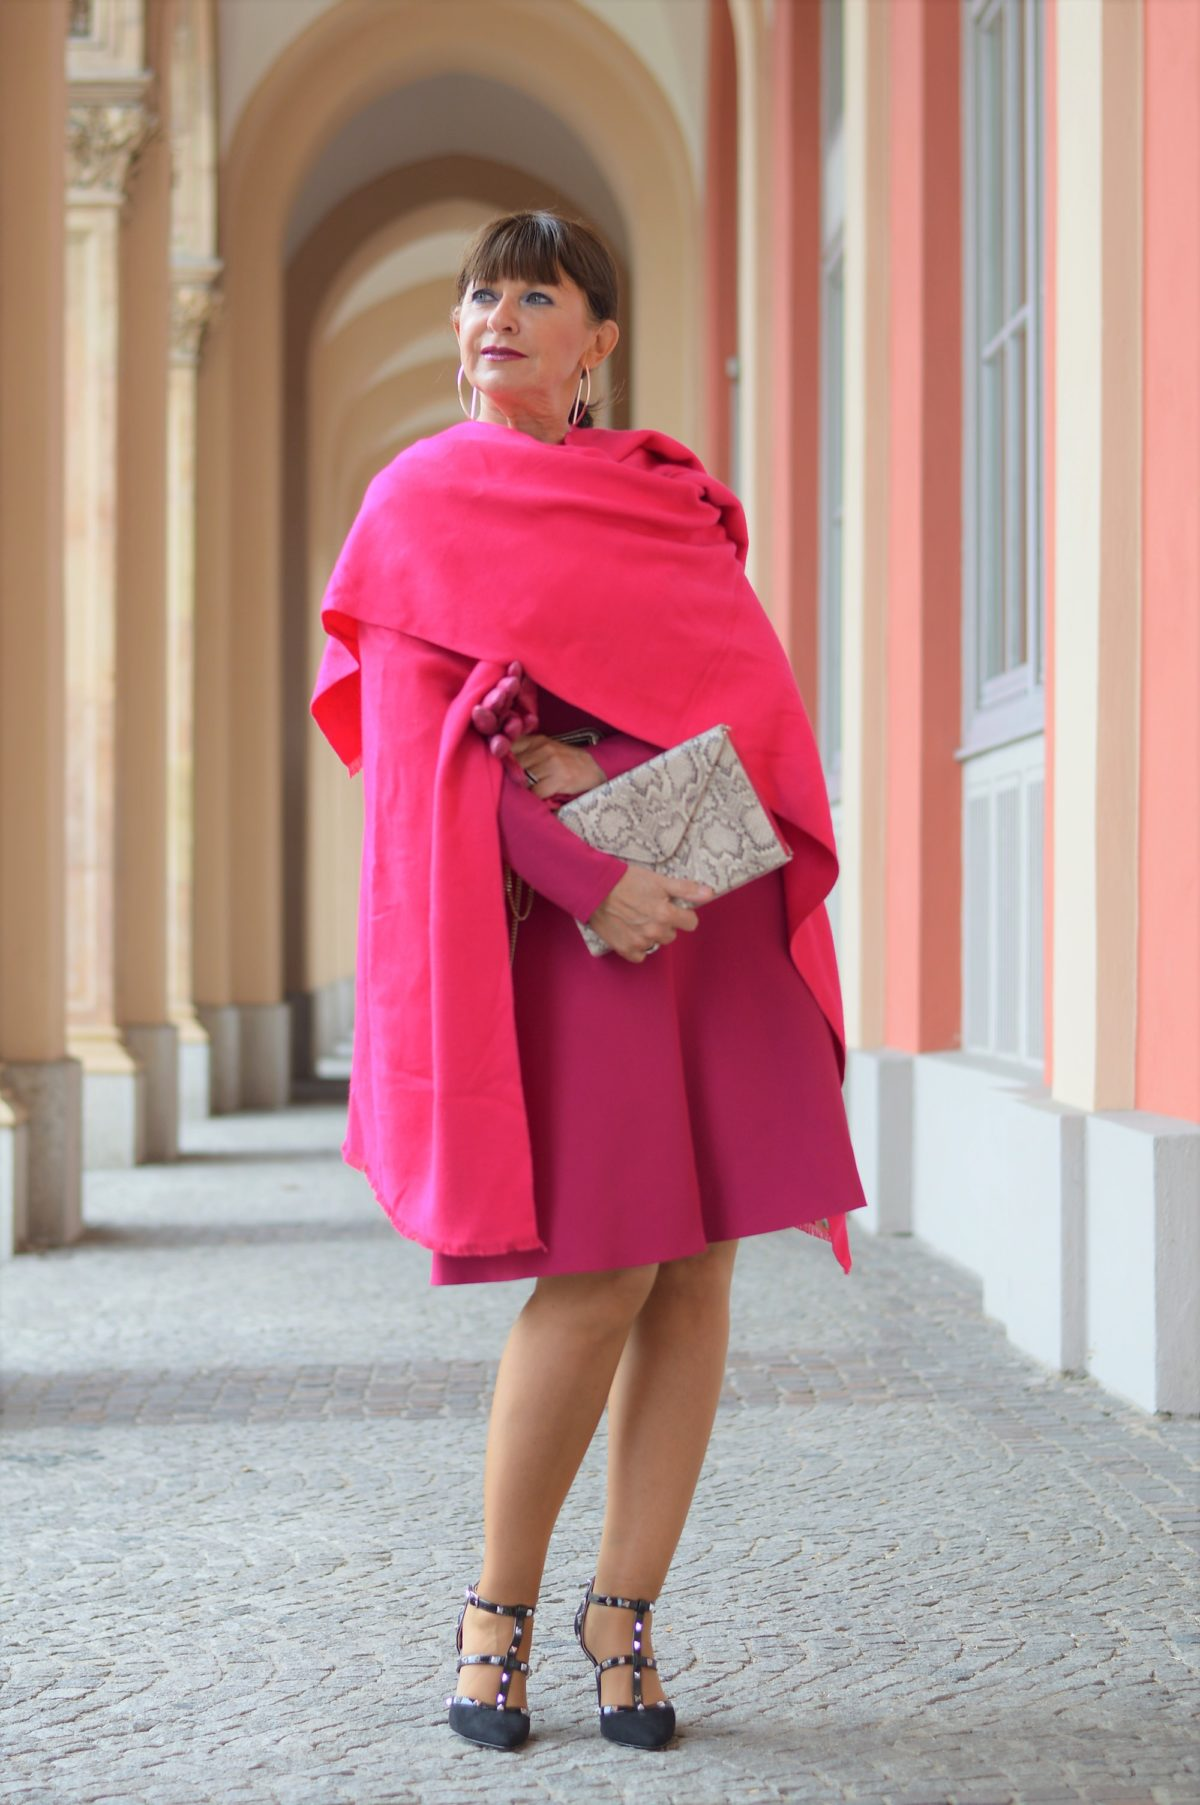 Pinkfarbiges Kleid